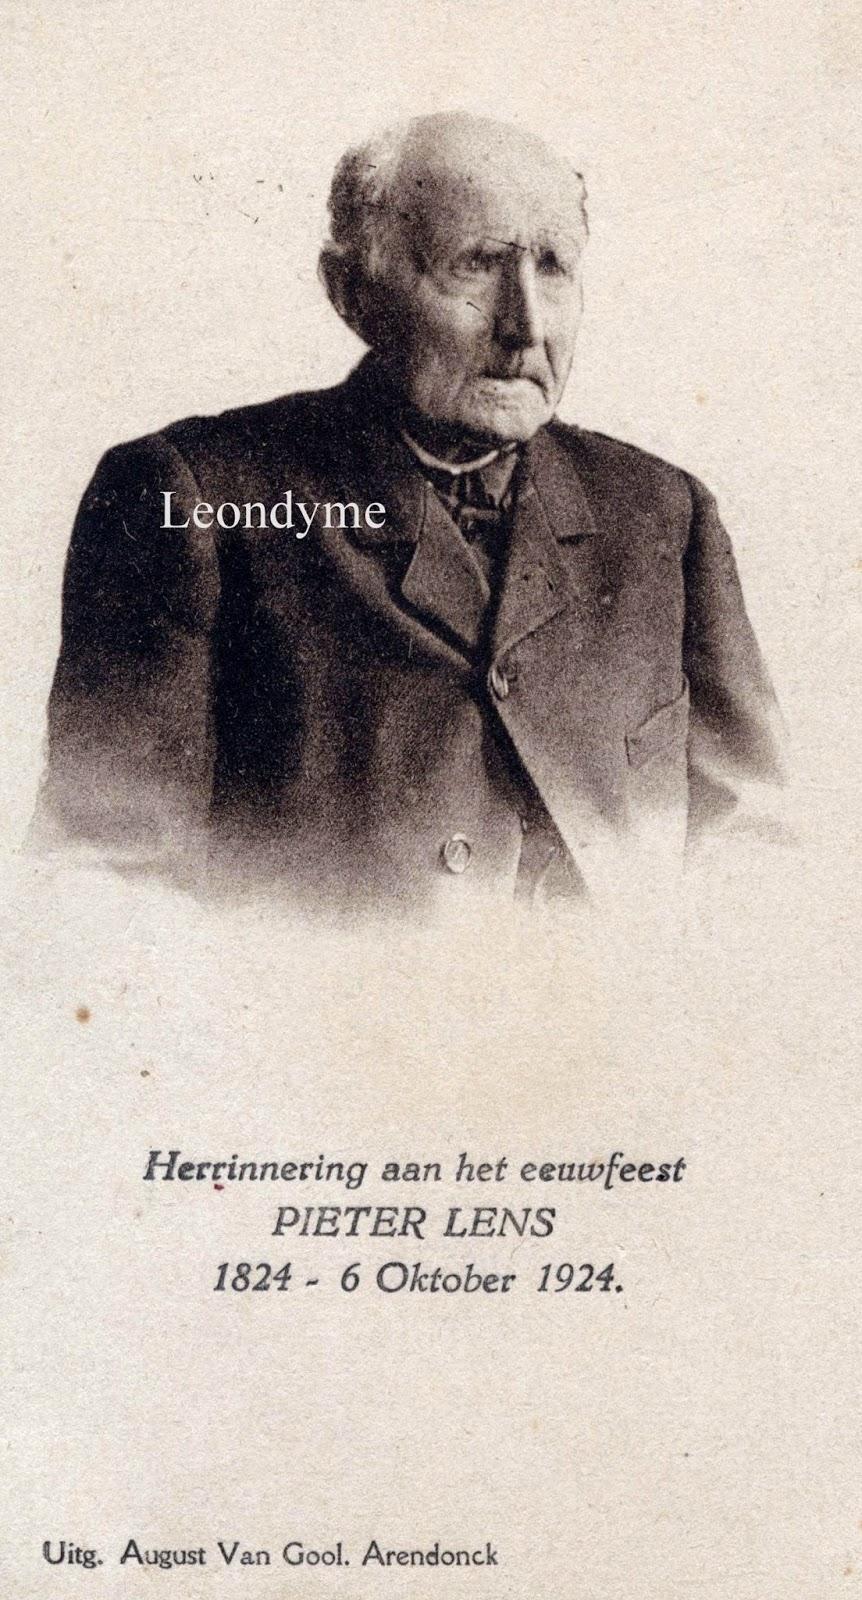 Petrus Lens 06-10-1824 Arendonk-22-02-1927 Arendonk. Verzameling Leondyme